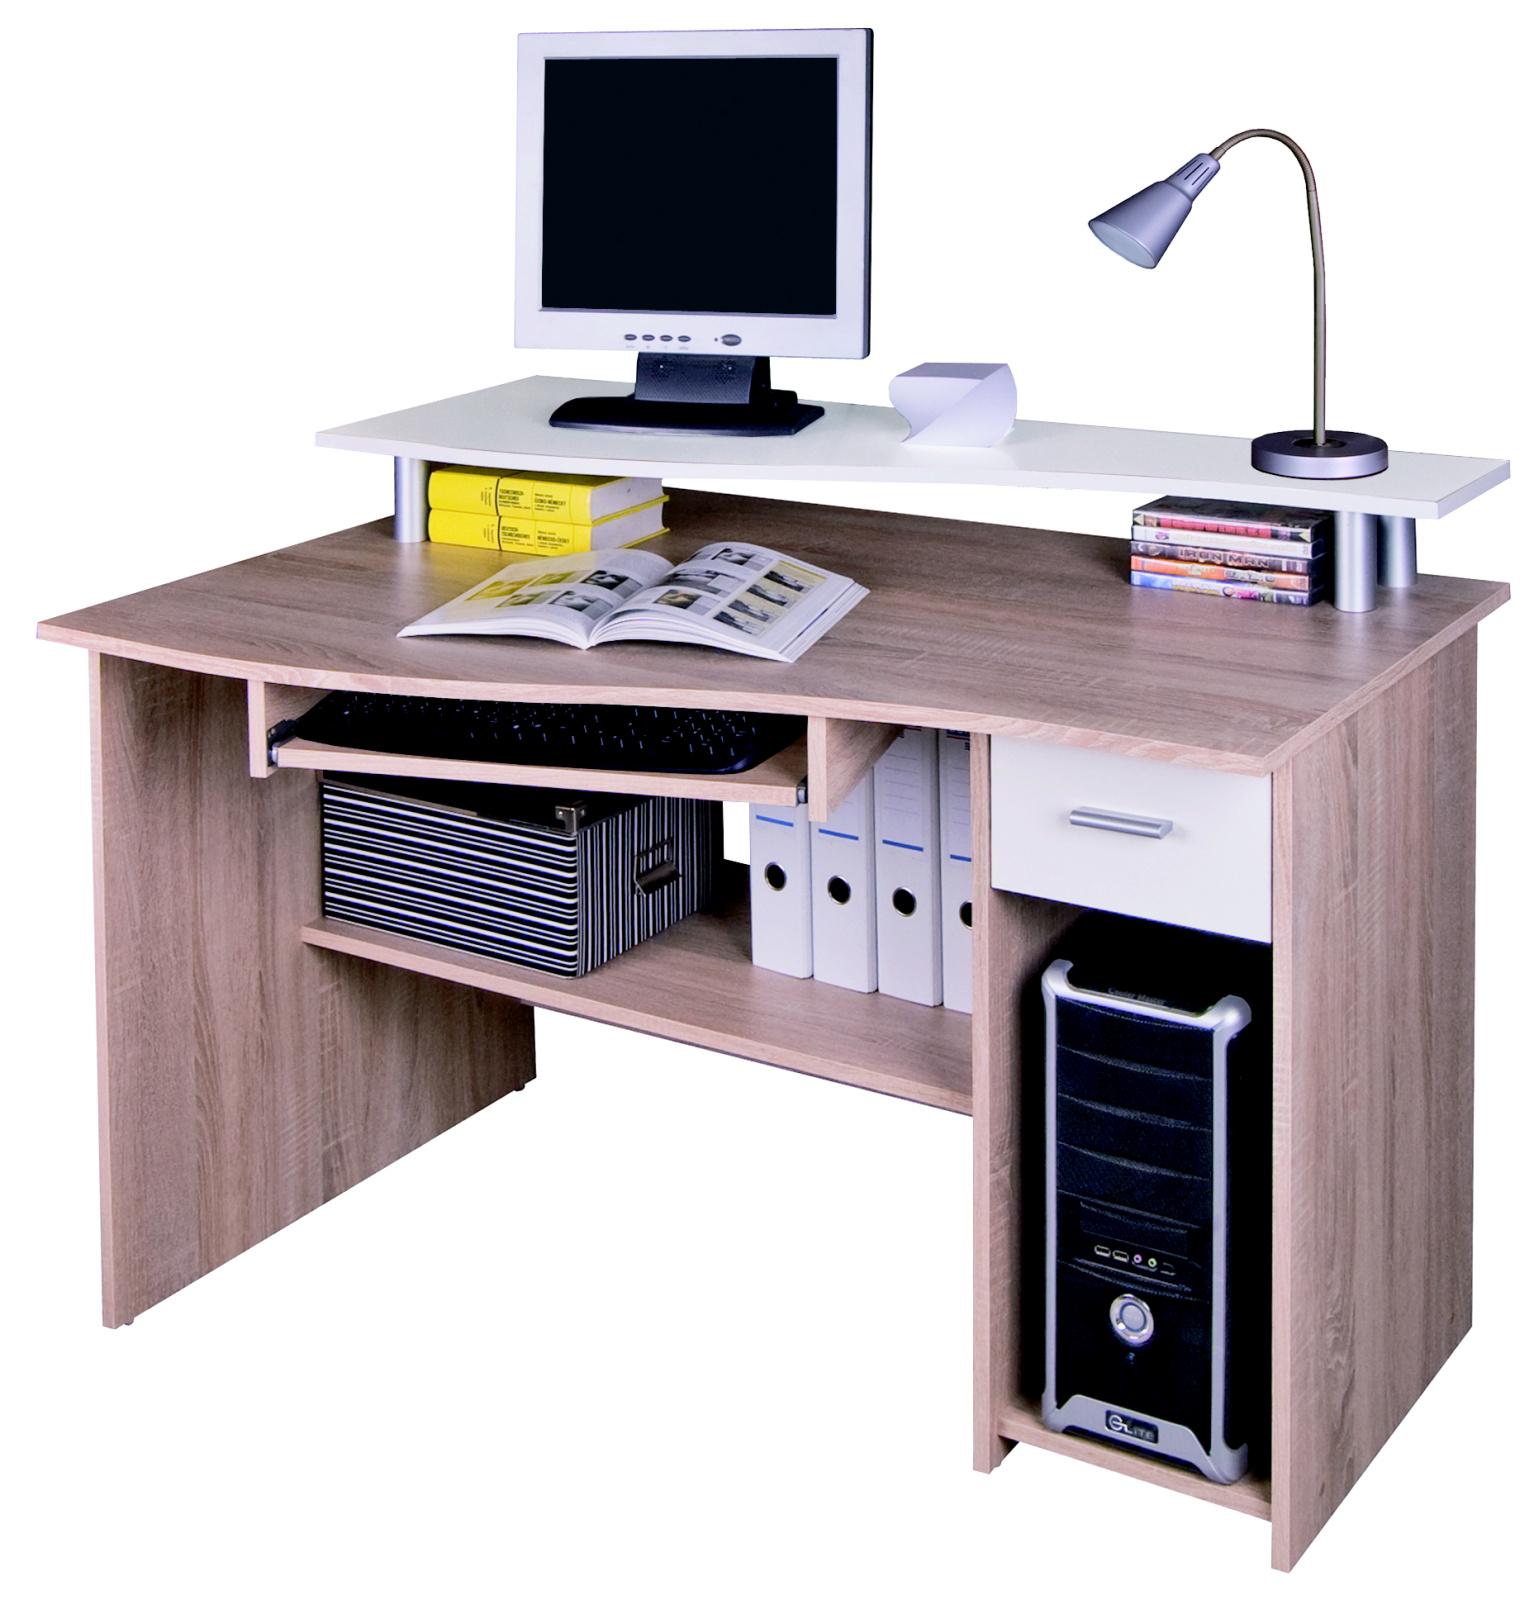 MB Domus Kancelářský PC stůl LEON, dub sonoma/bílá